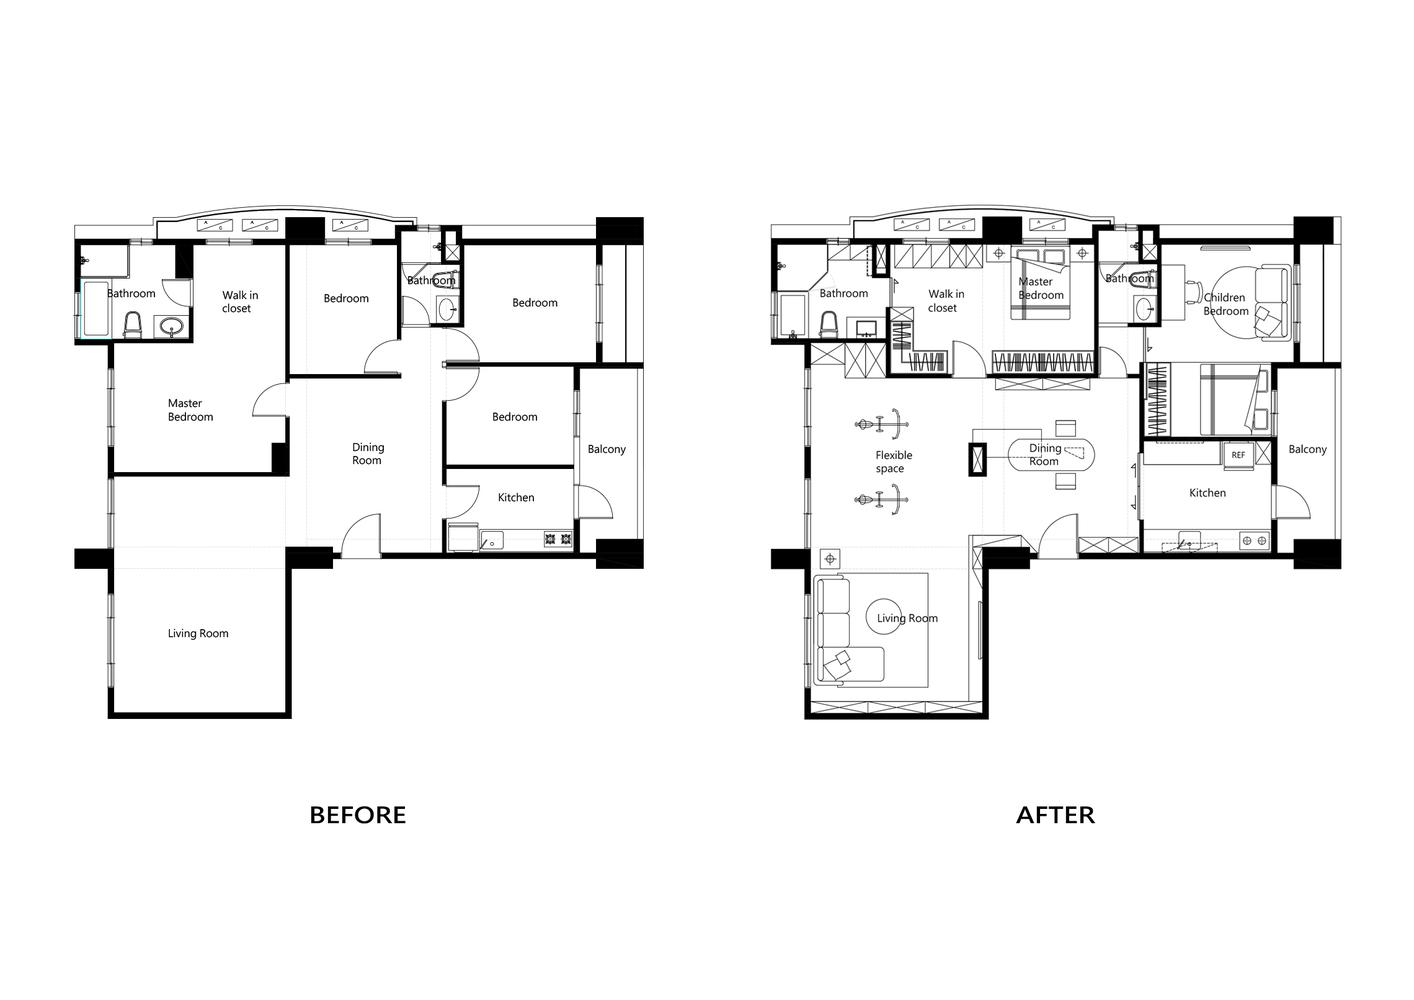 2.Before After Floor plan